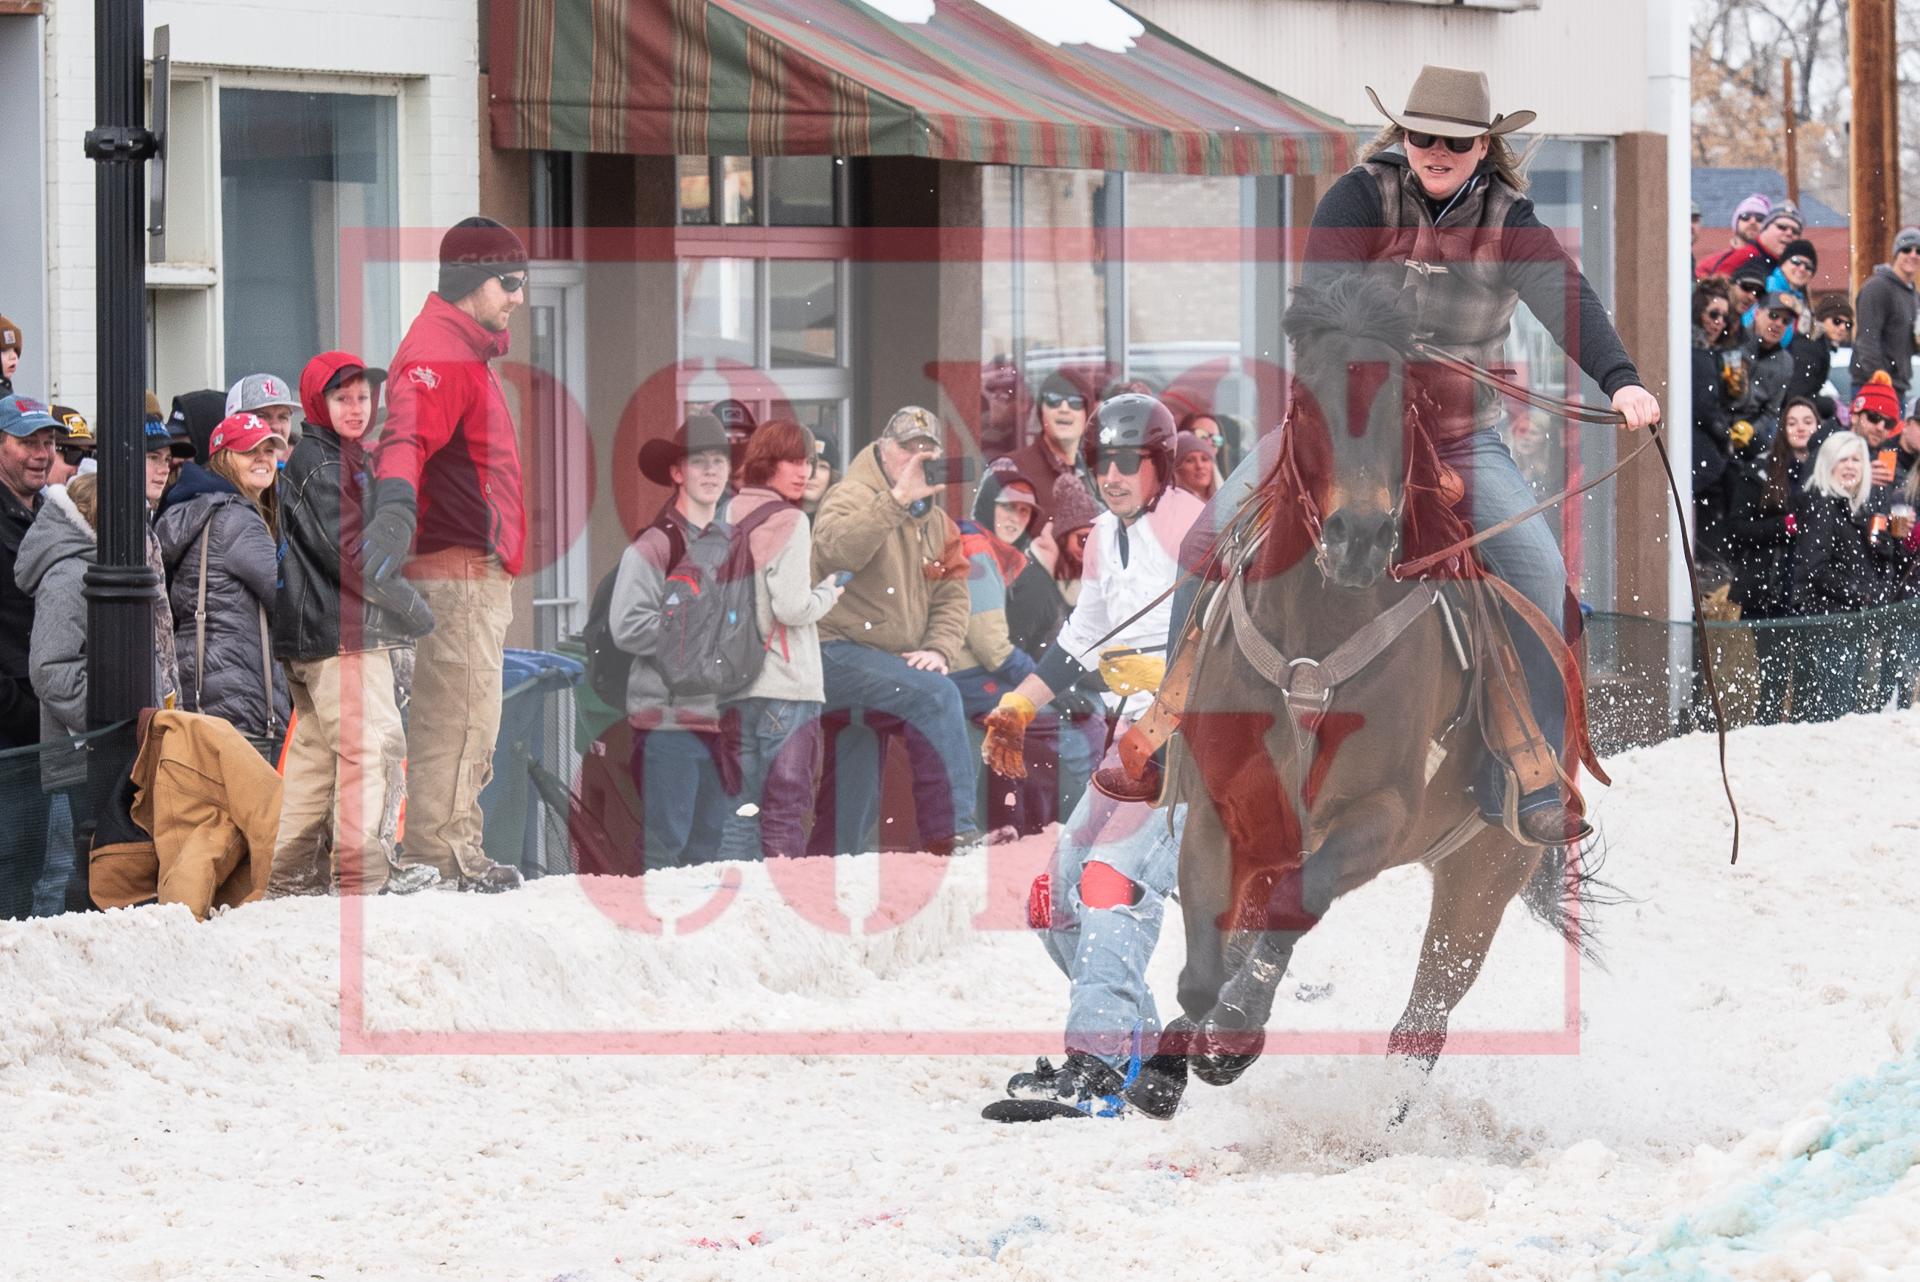 - Monica Plecker - Snowboard 4